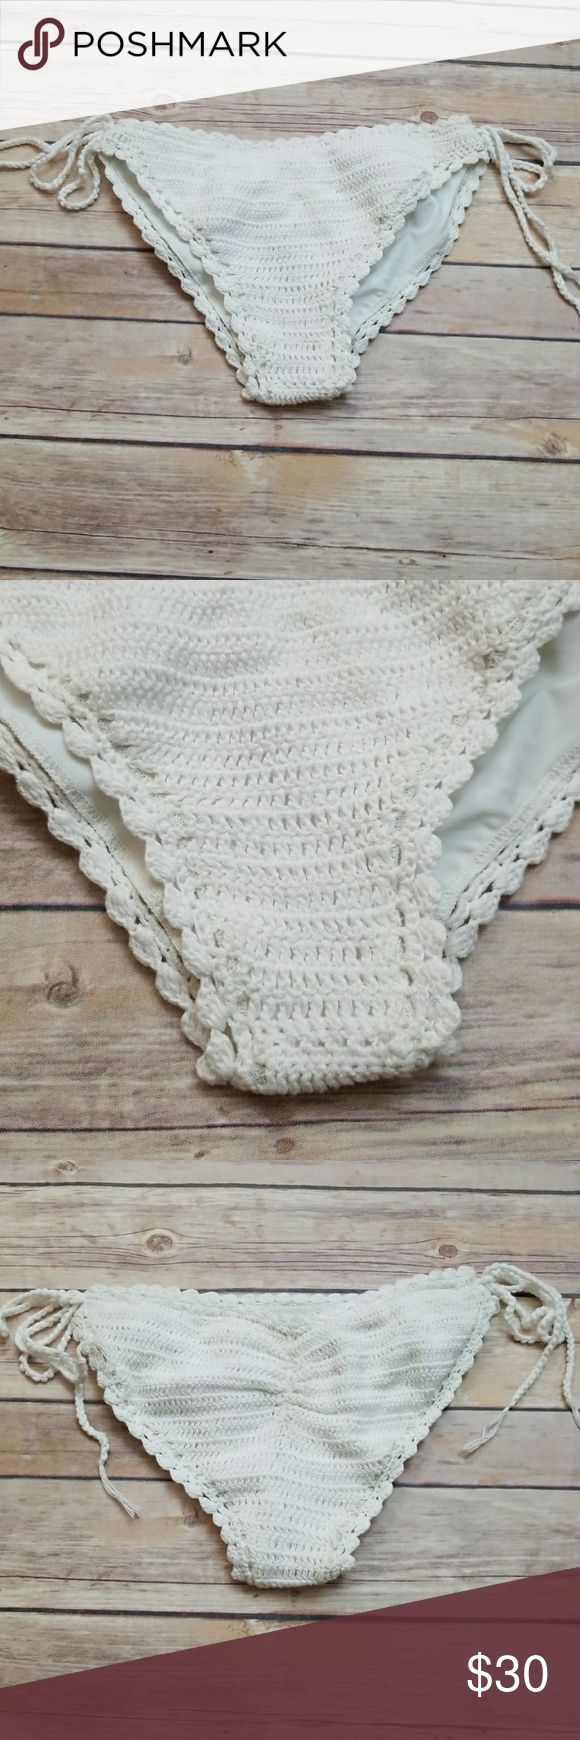 Beach riot bikini LAST ONE!!! brand new crochet white bottoms only Beach Riot Swim Bikinis